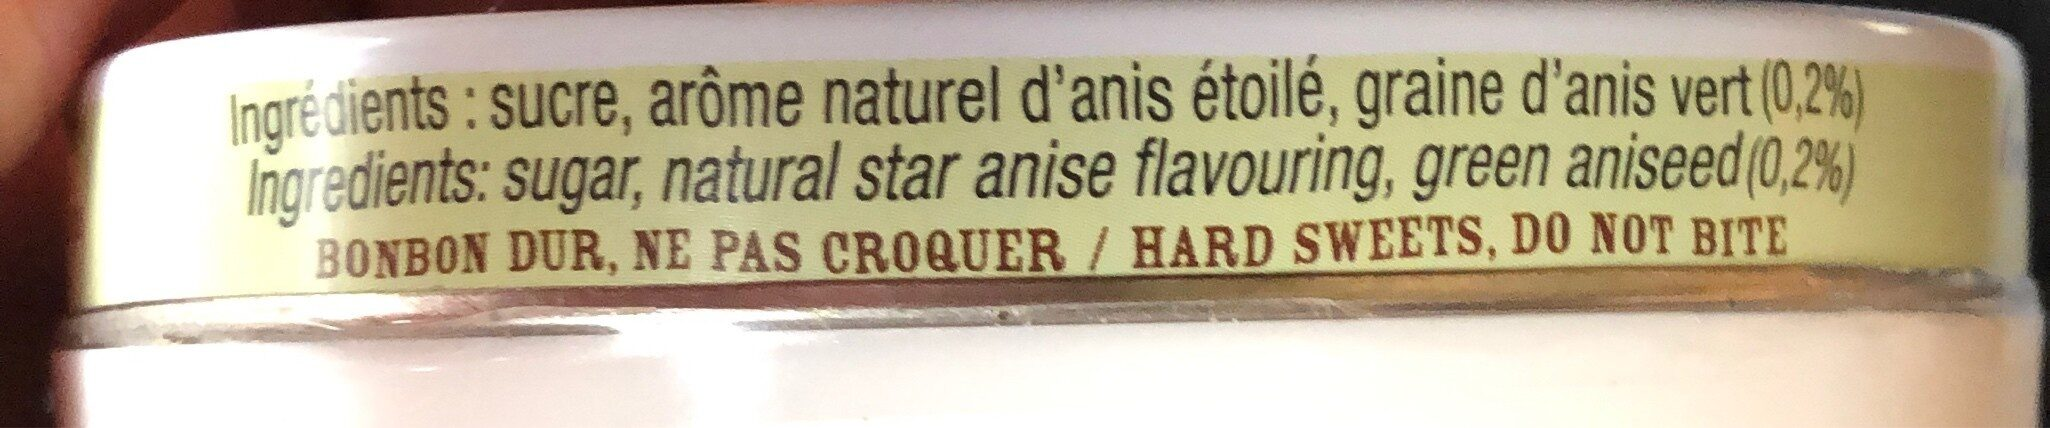 Les anis de Flavigny - Ingredients - fr